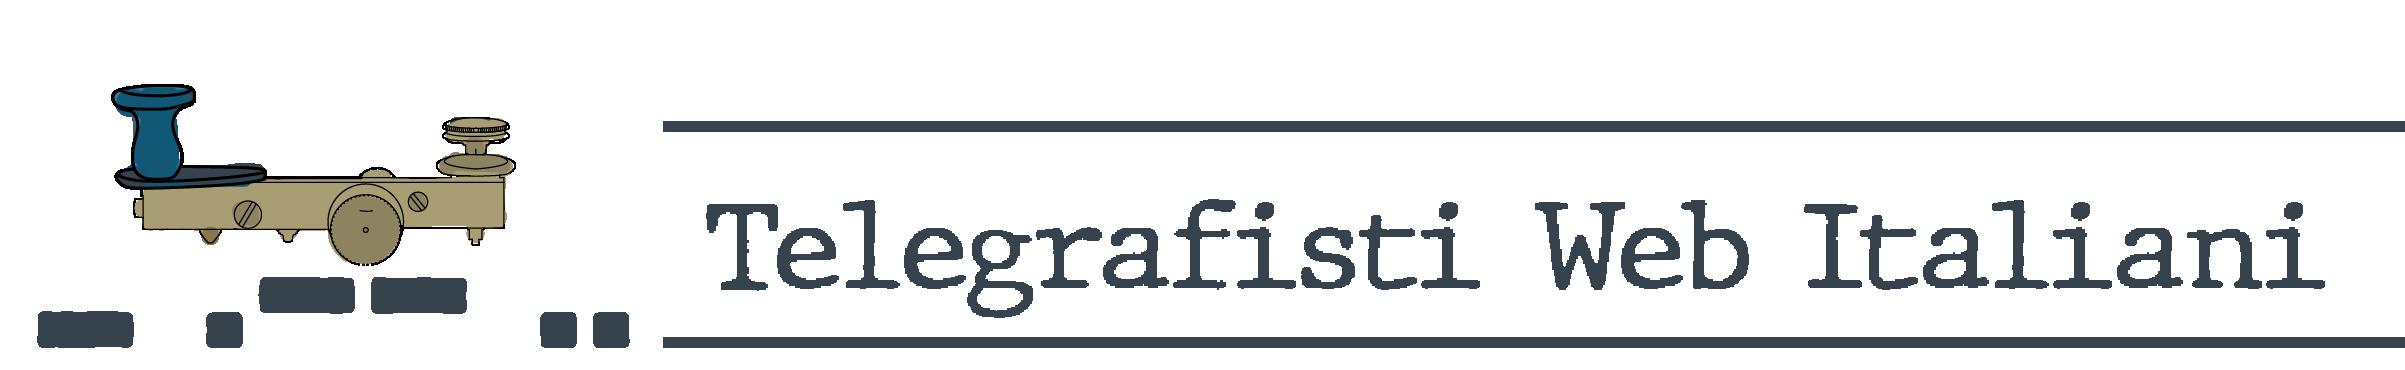 Telegrafisti Web Italiani